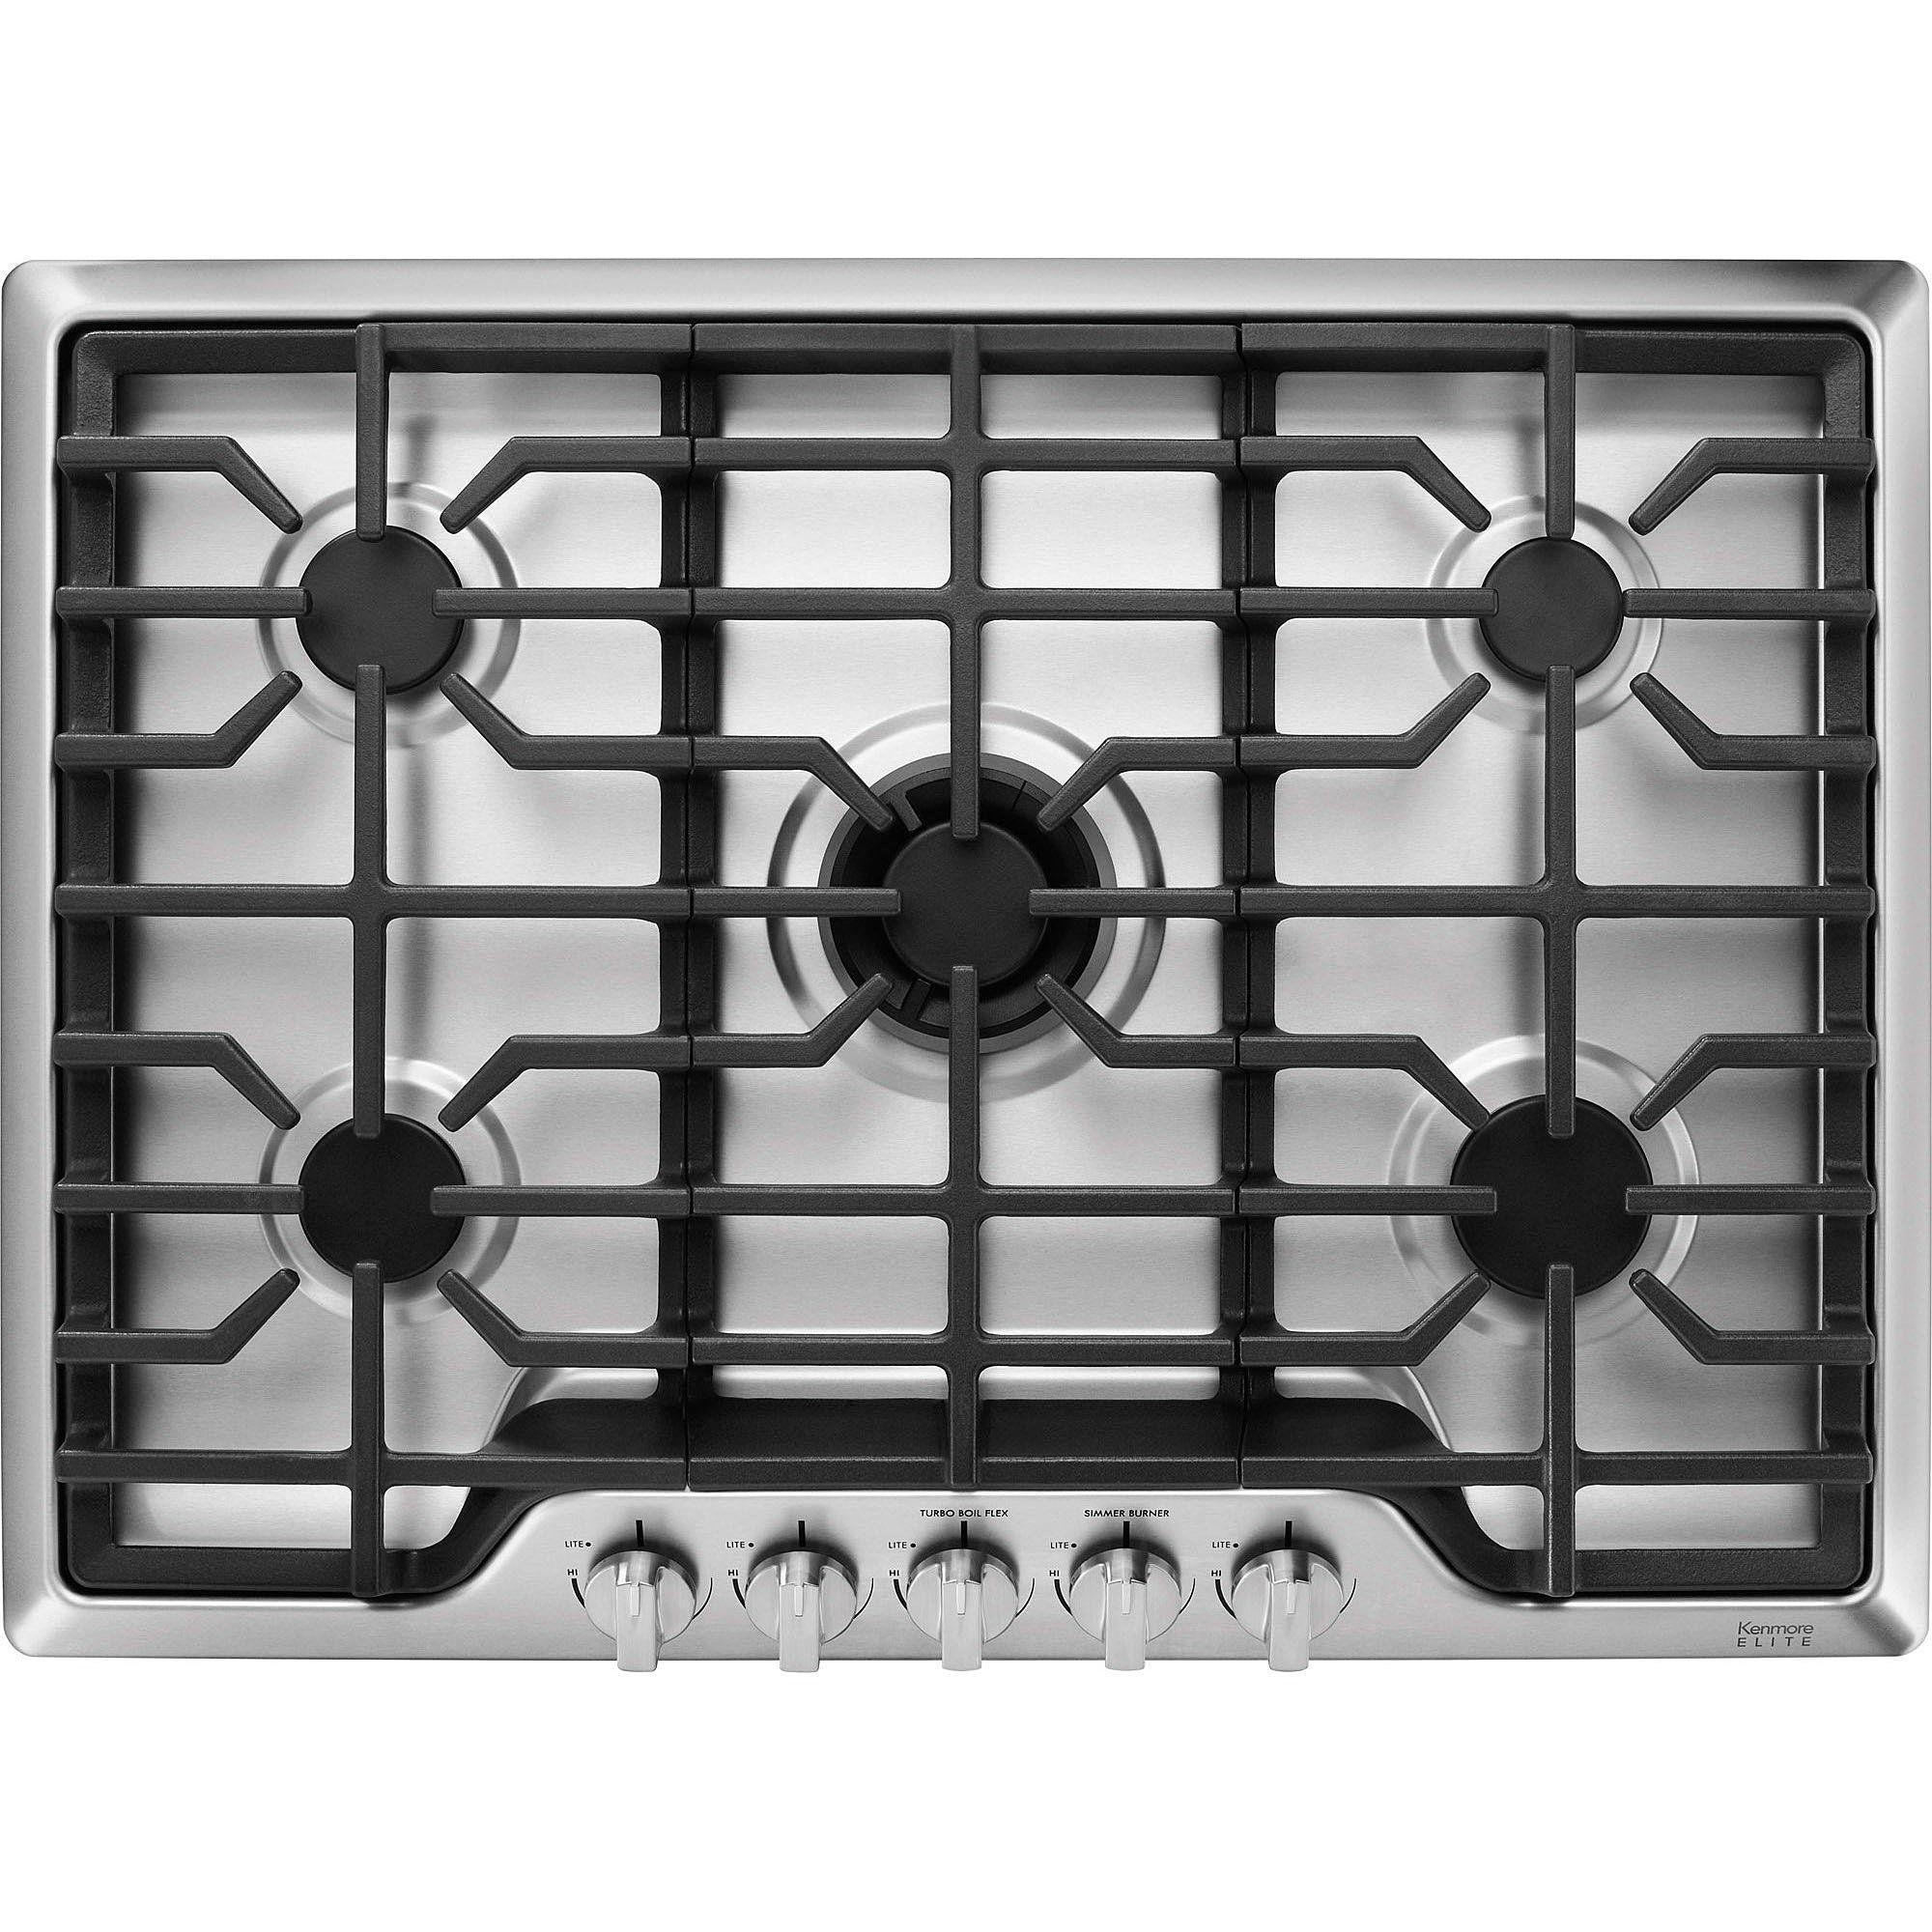 Kitchenaid 30 inch gas cooktop stainless steel kitchen